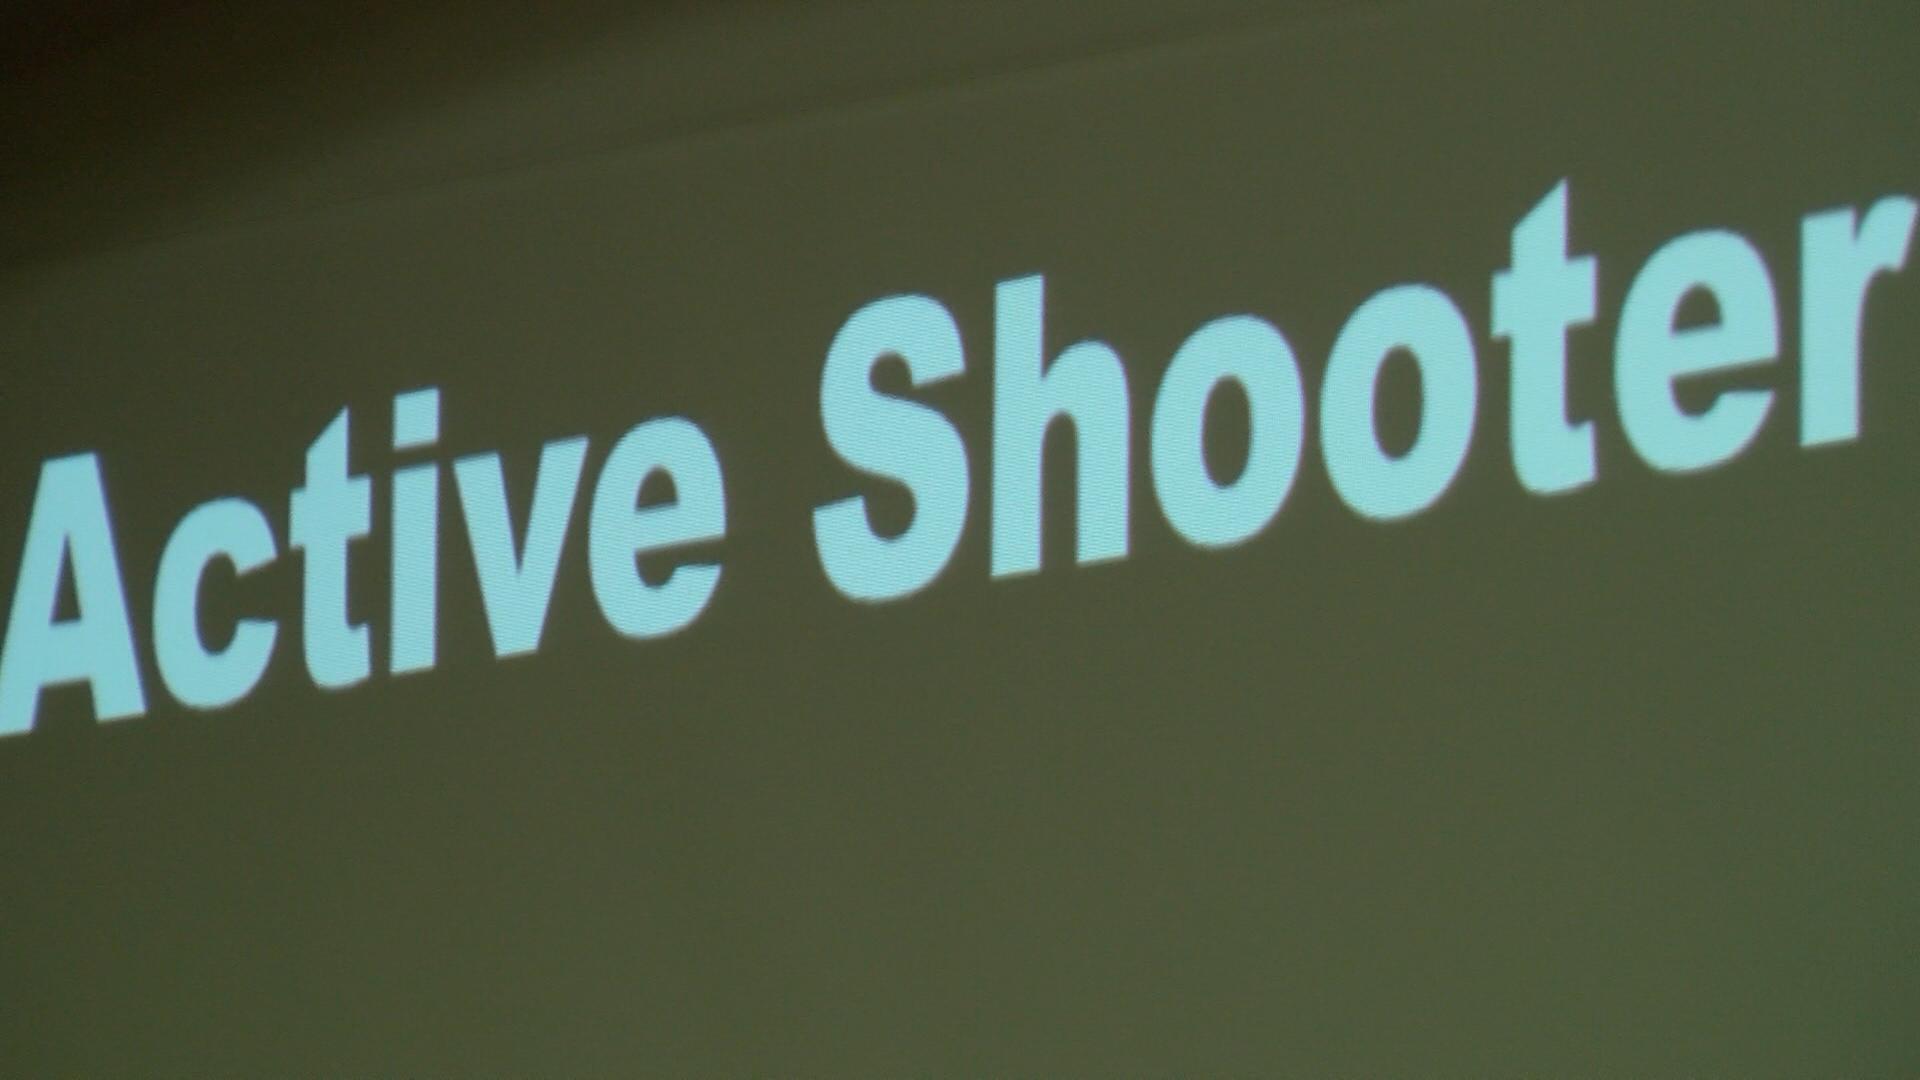 active shooter_1523997782578.jpg.jpg